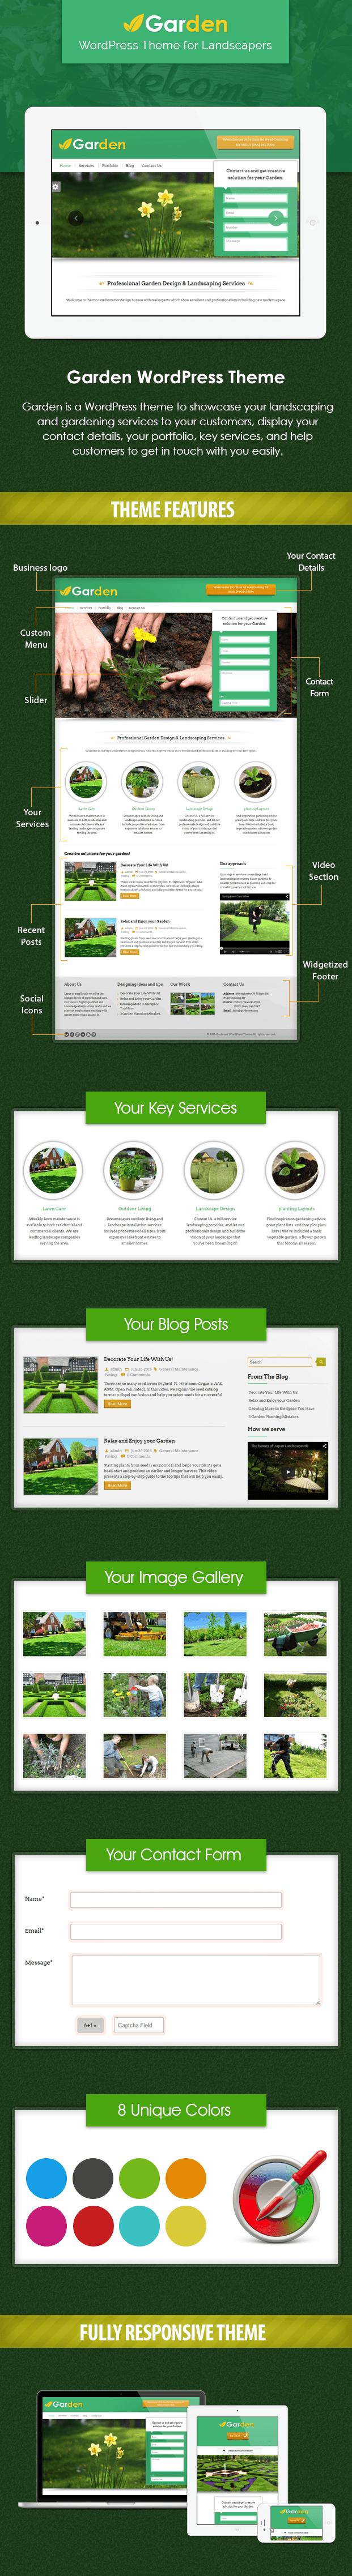 landcapers wordpress theme